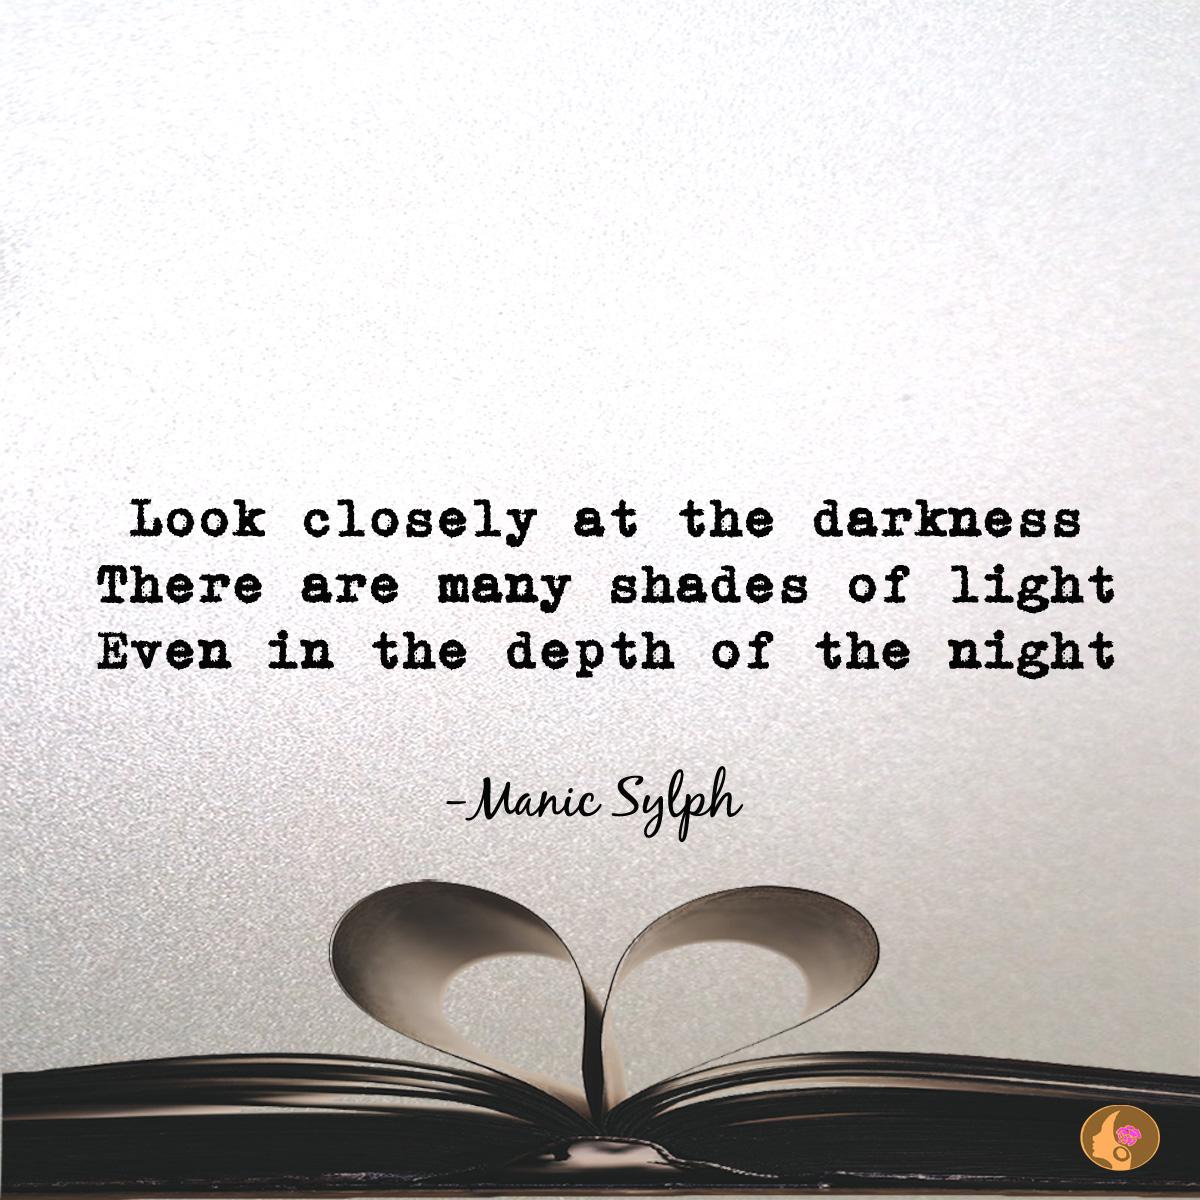 Micro poem 'InkSplash~7' by Mona Soorma aka Manic Sylph